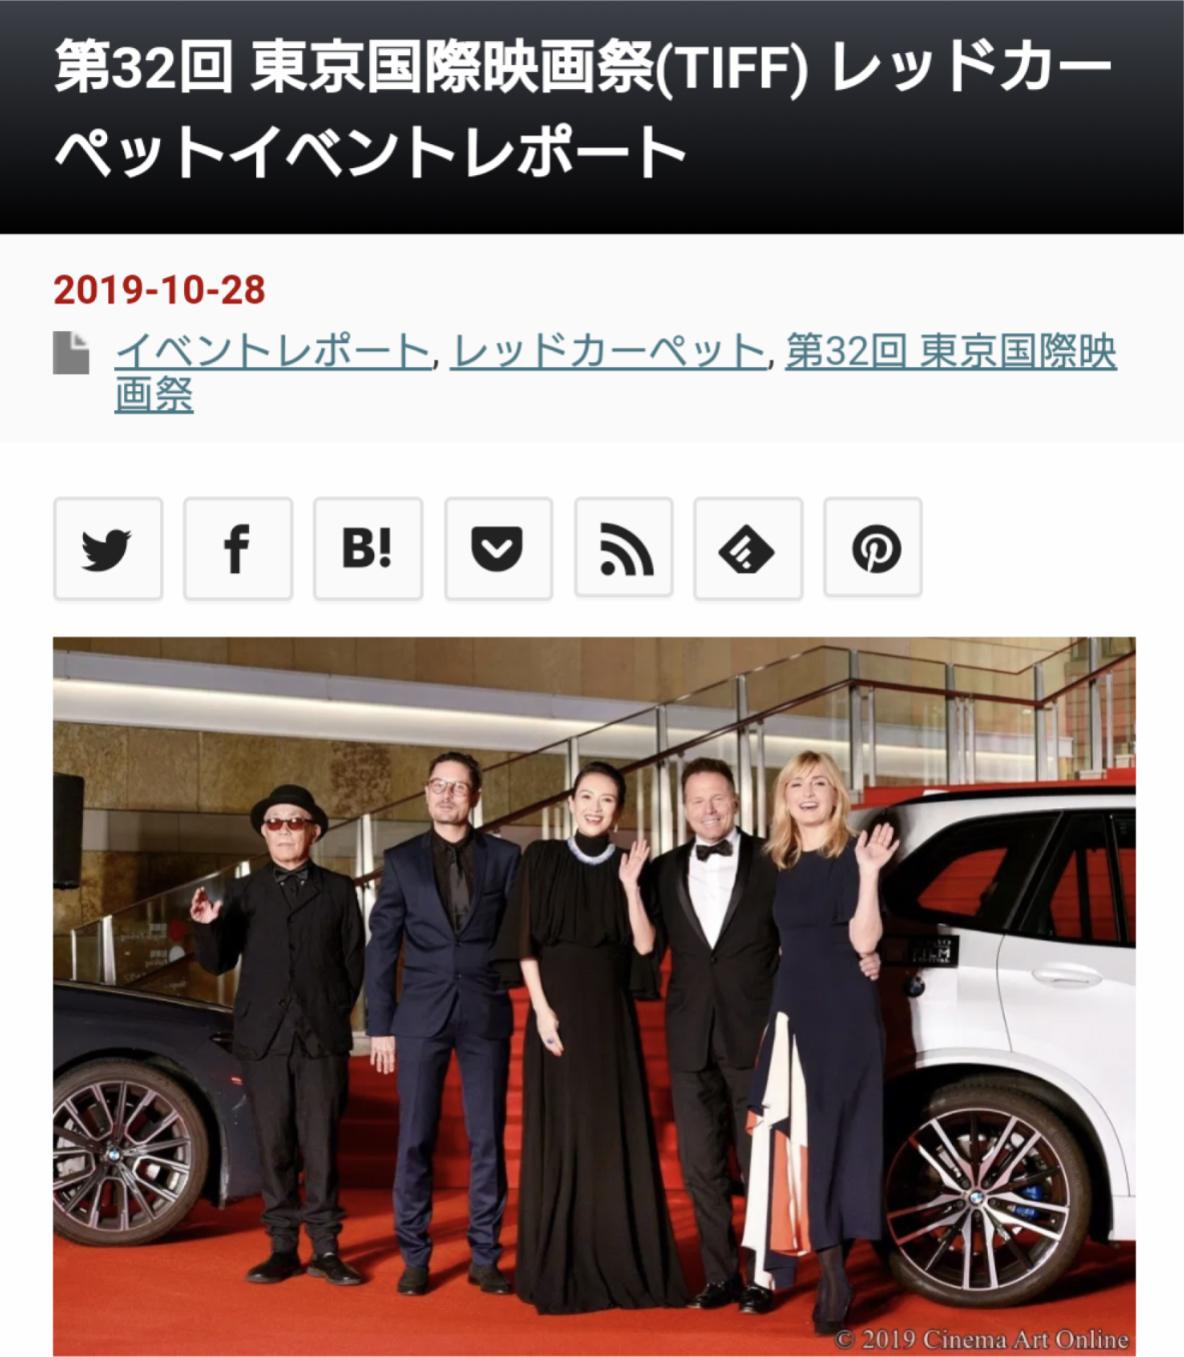 Cinema Art Online 第32回 東京国際映画祭(TIFF)レッドカーペットイベント書きました